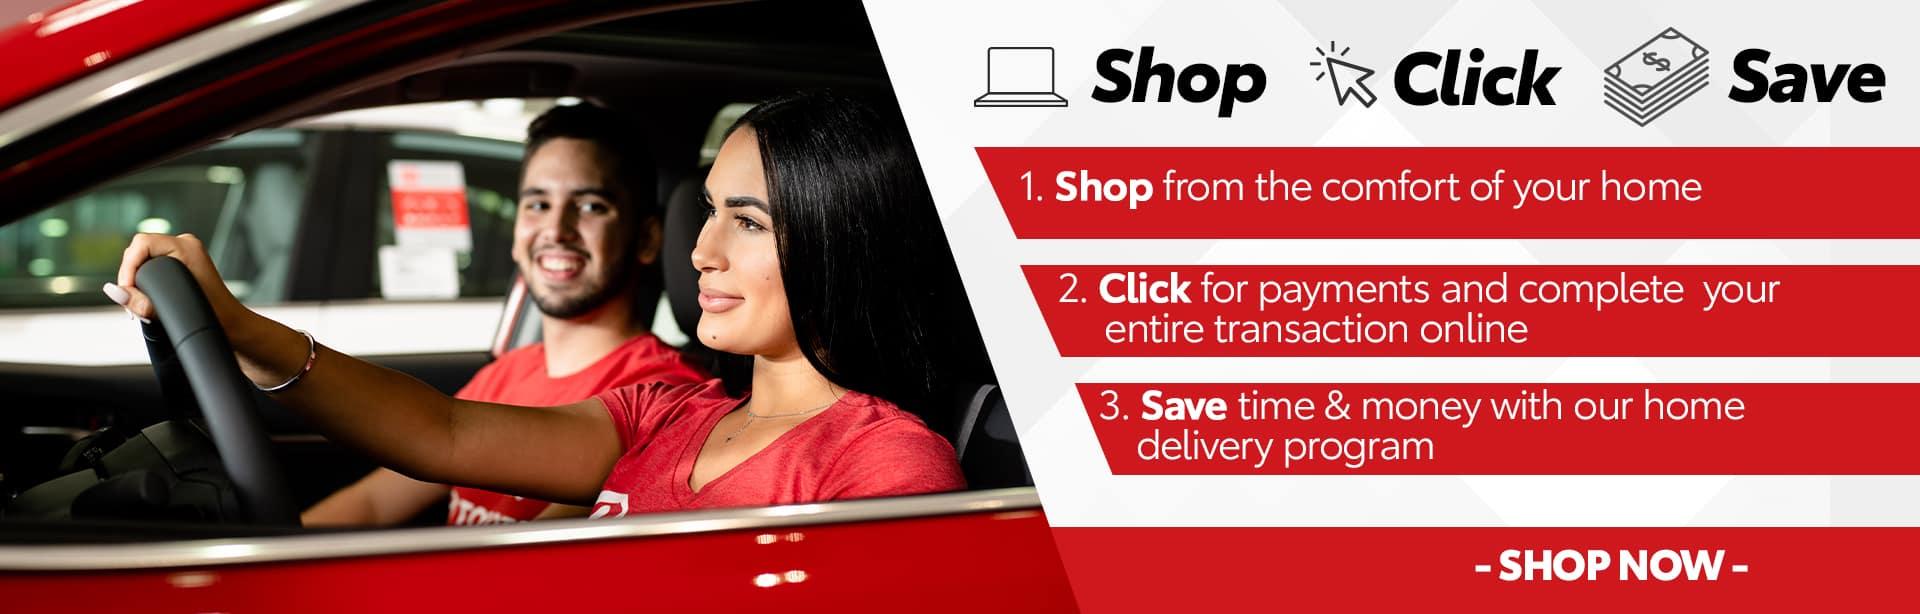 DOTO87998-01-Shop-Click-Save-Update-mockup2 (1)